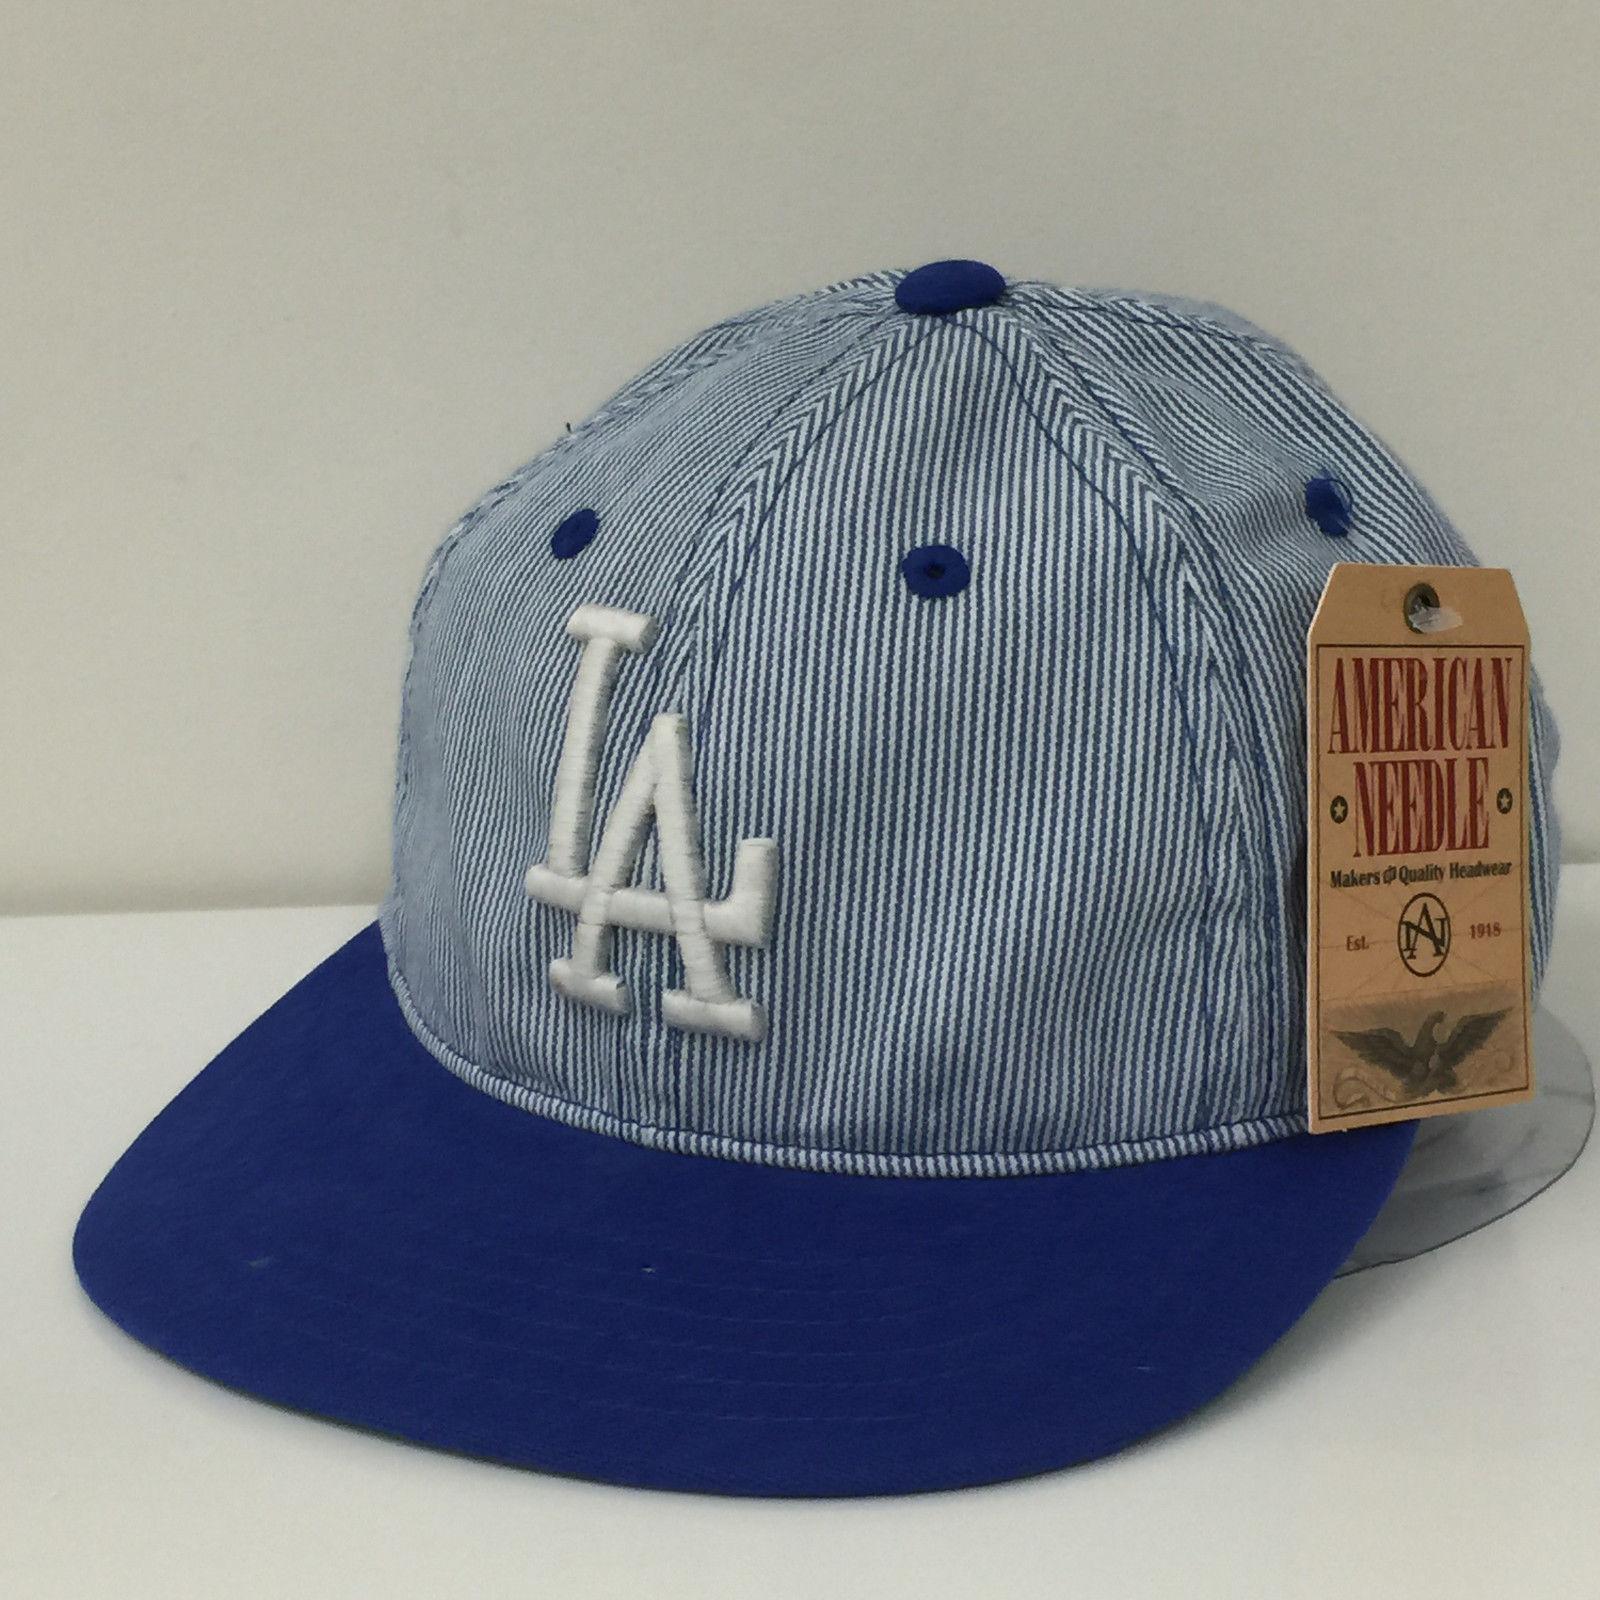 American Needle MLB Los Angeles Dodgers Upper Deck Adjustable Cap Hat 12945